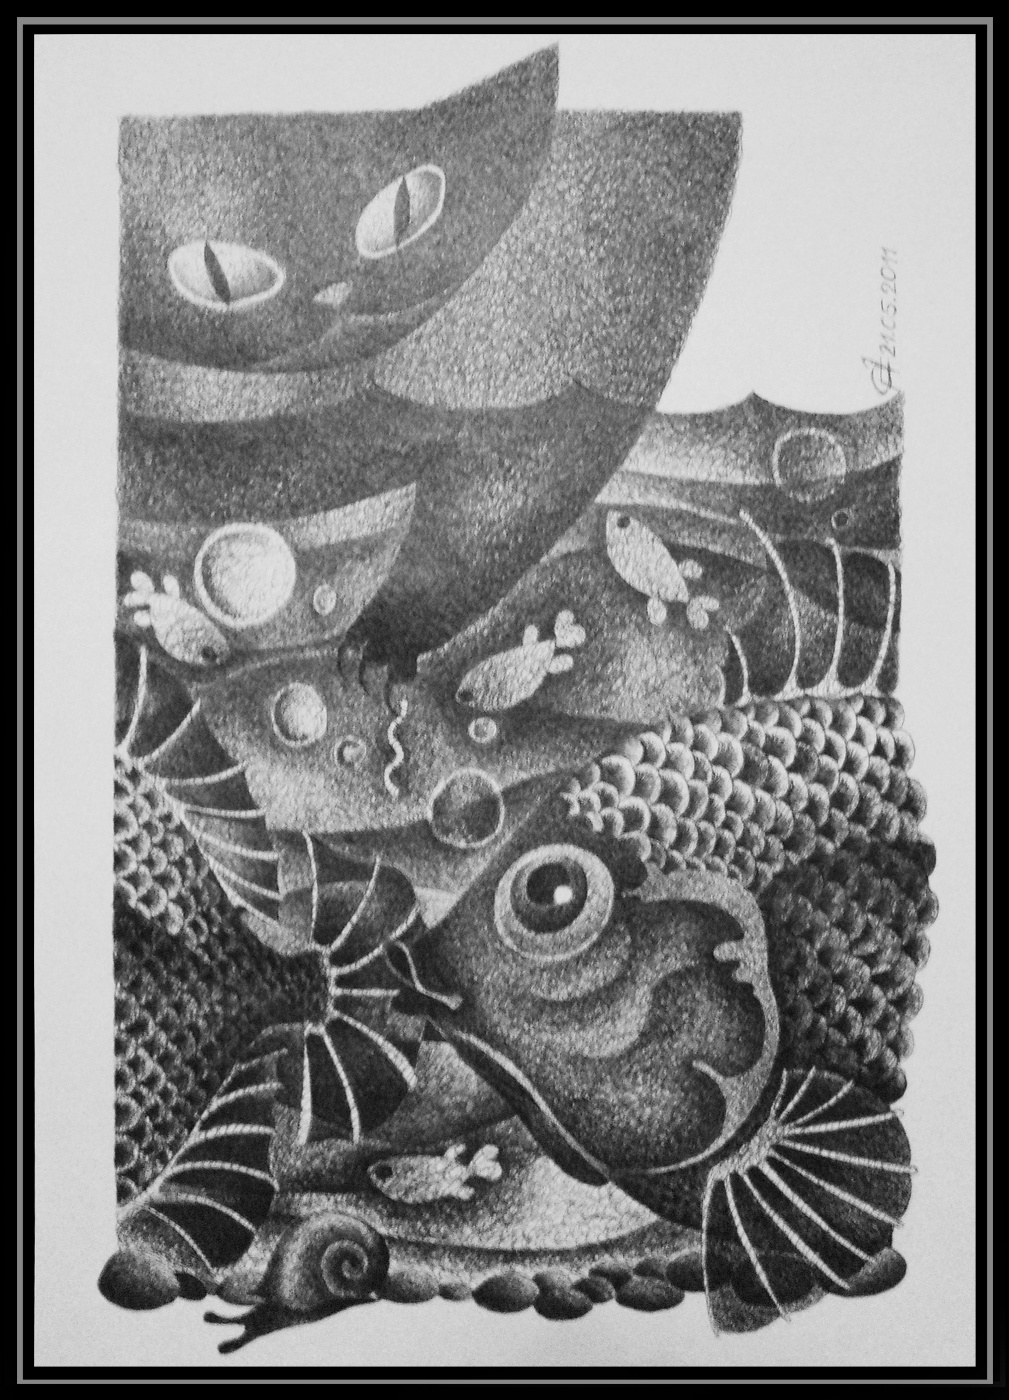 Georgy Stepanov. BIG FISH